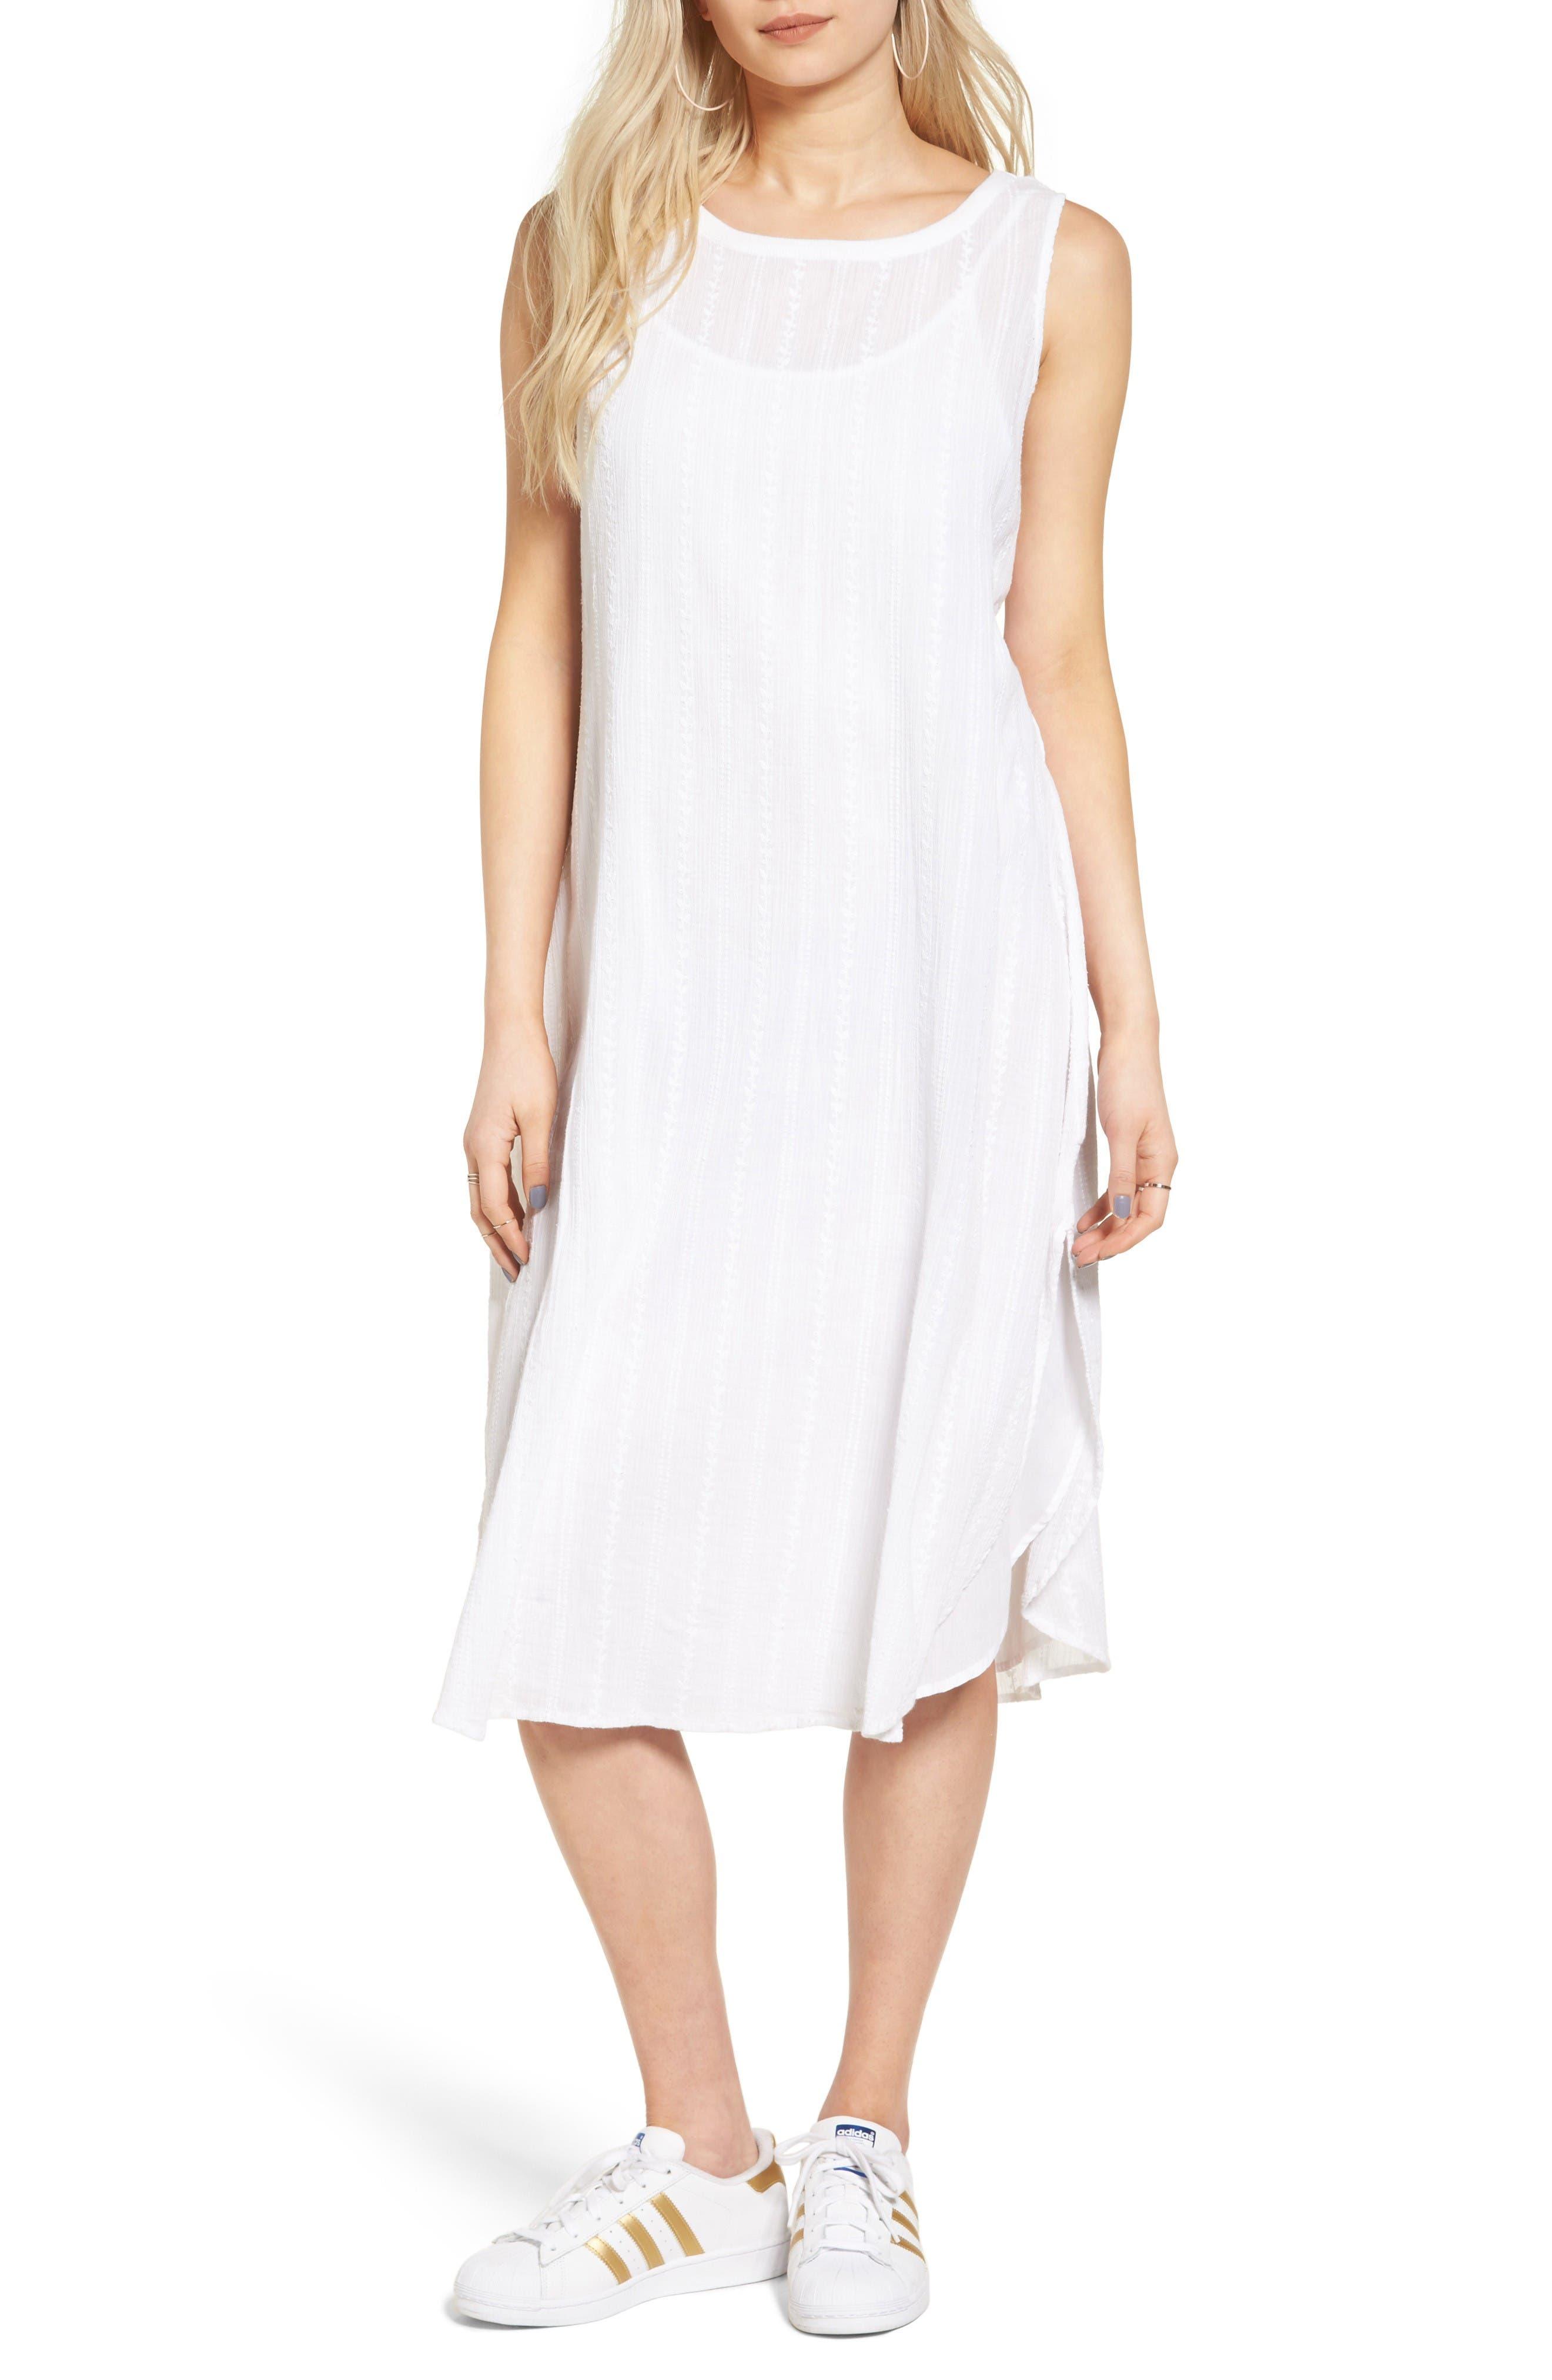 O'Neill x Natalie Off Duty Talin Cover-Up Dress